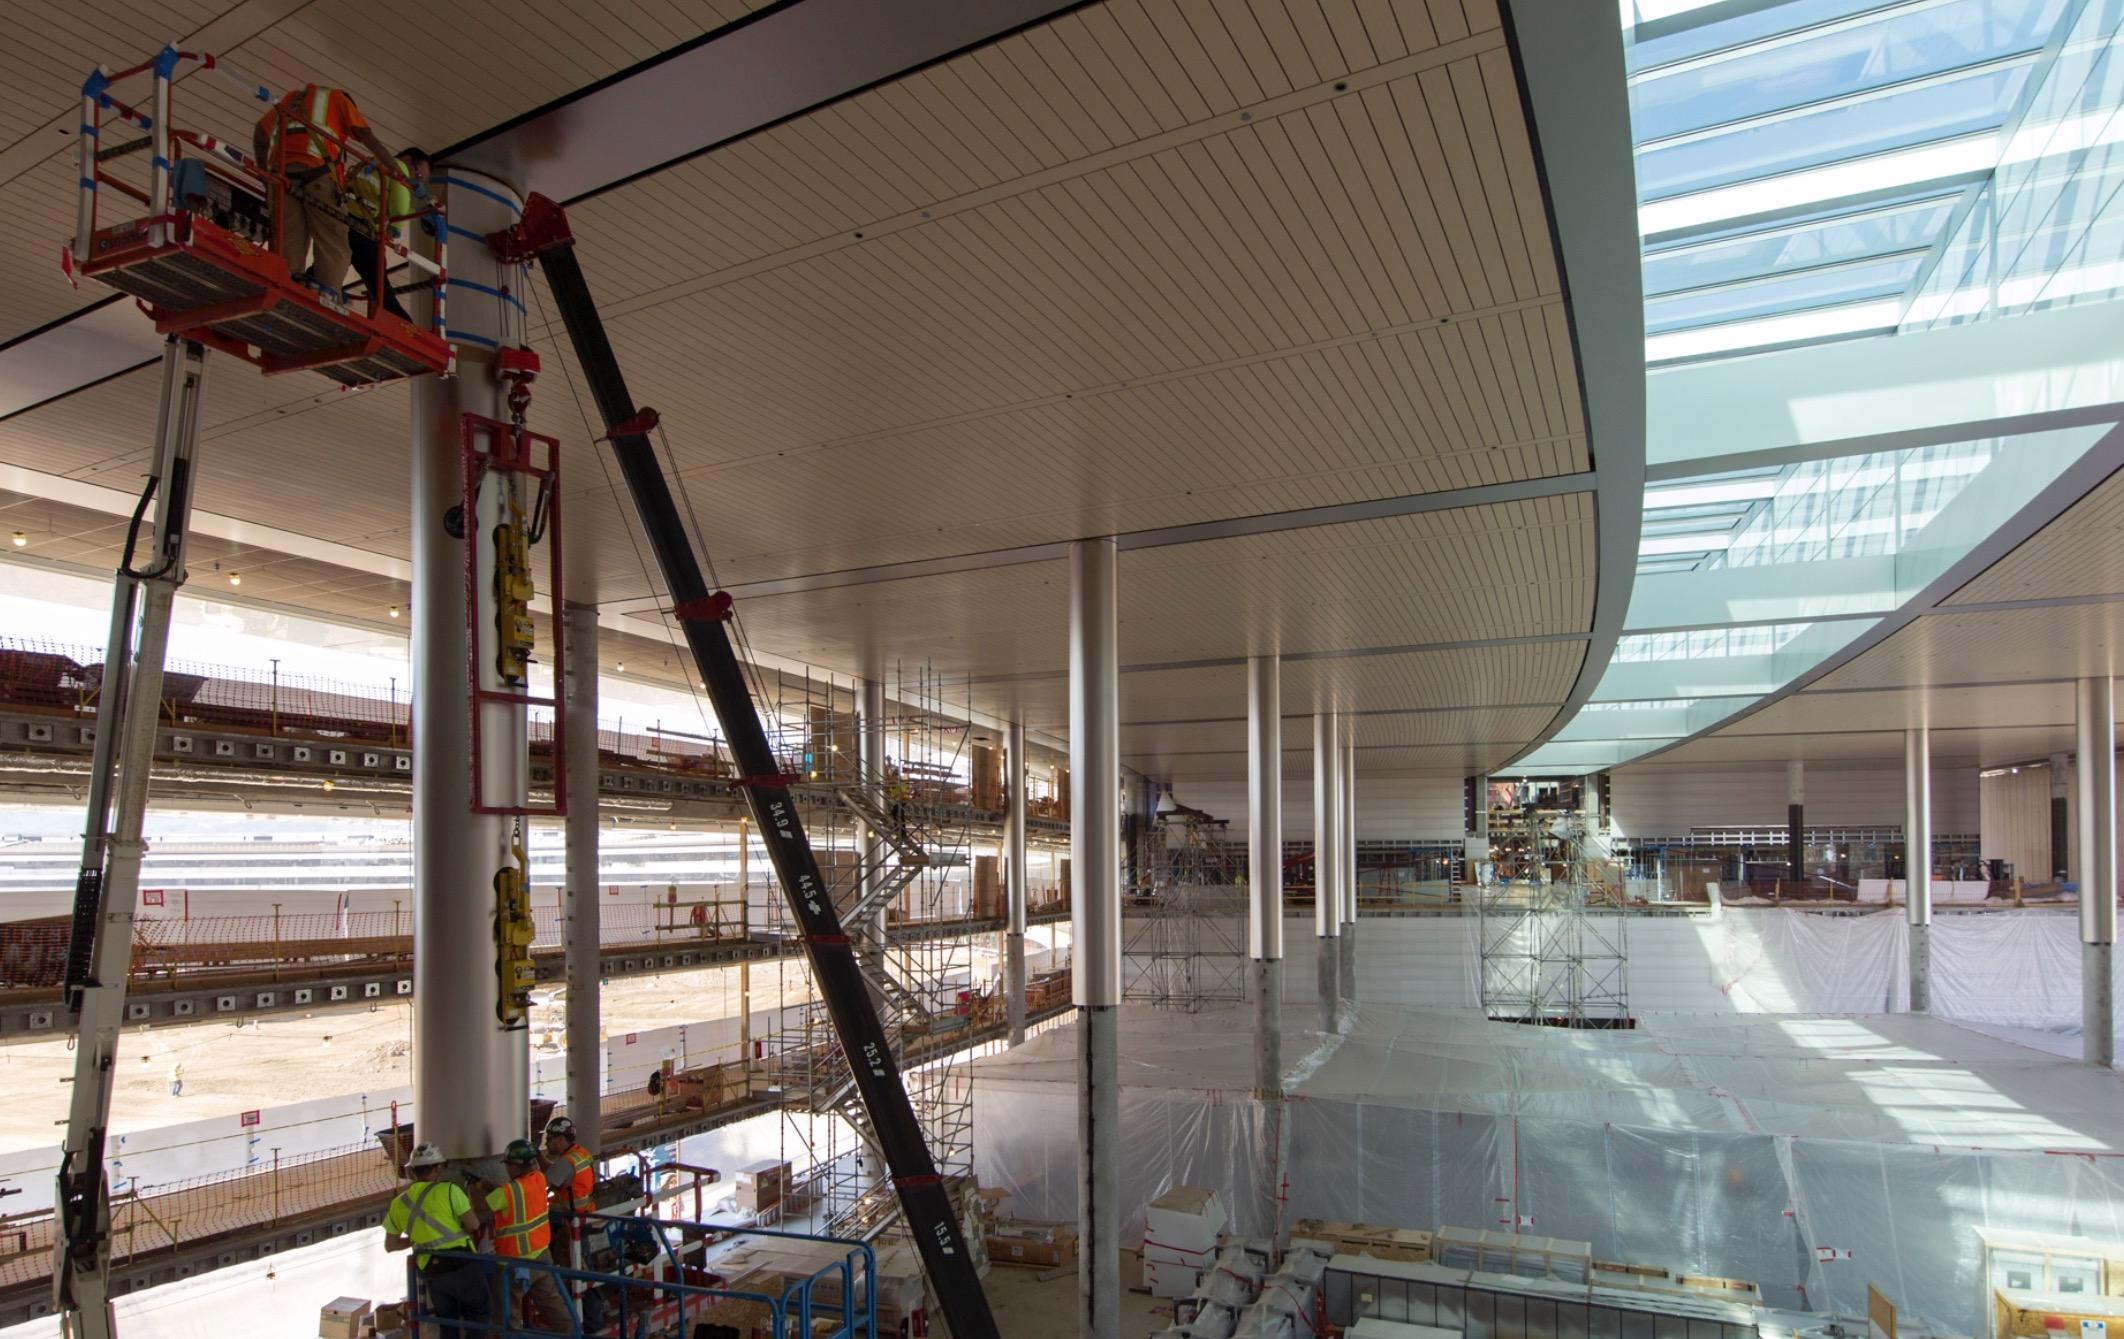 Apple Campus 2 cafeteria / cafeteria structure